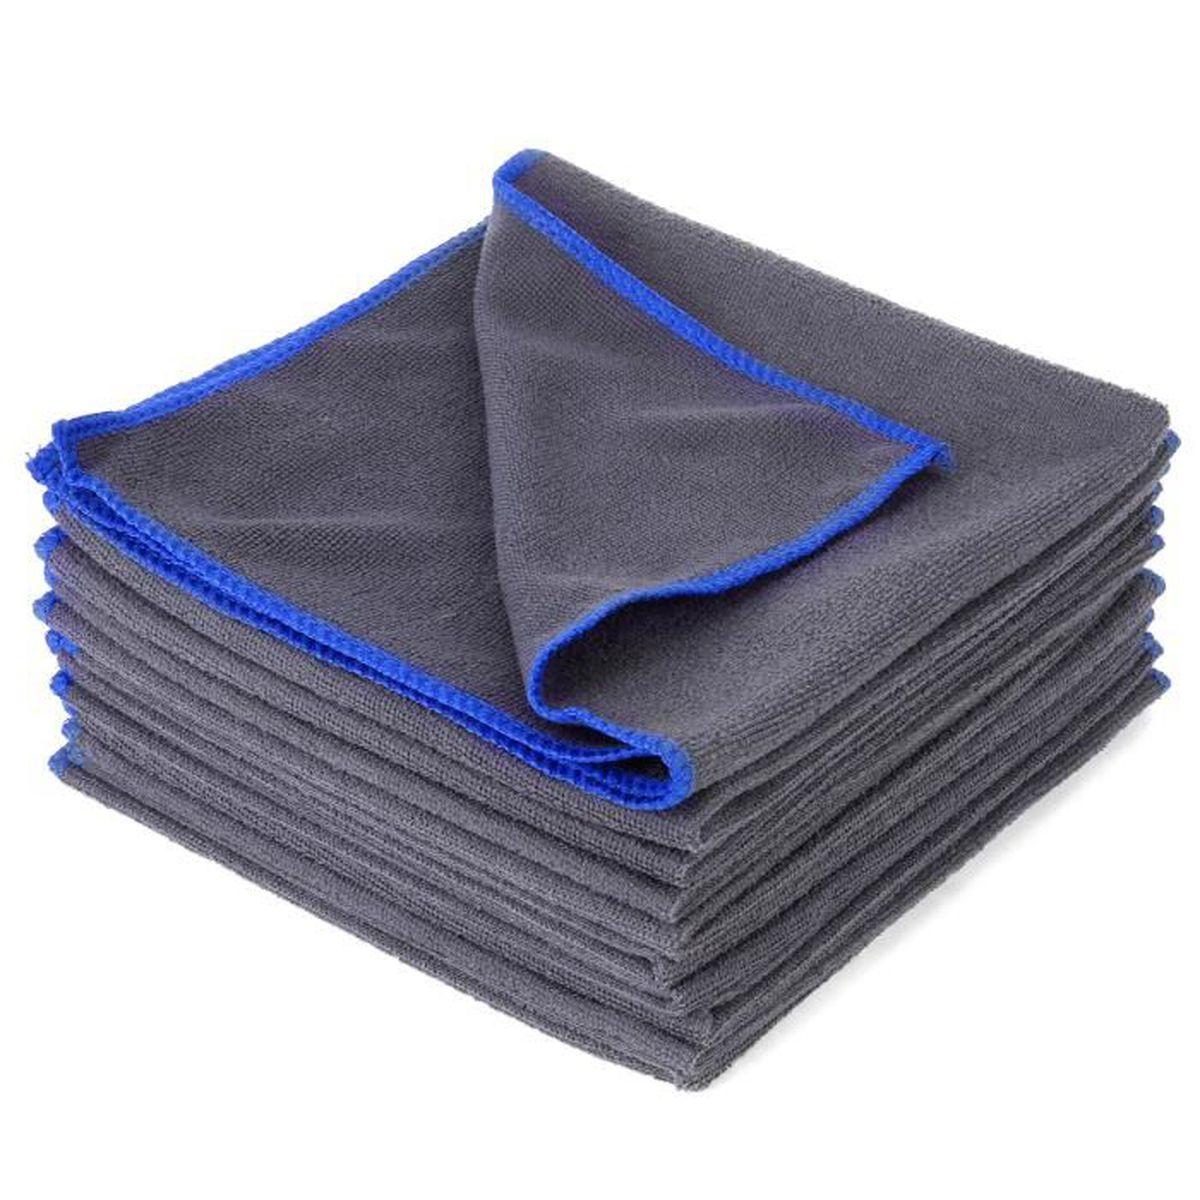 5 x Sprintus Micro Fibre foulards Vert microfibre chiffon foulards Torchons Chiffon